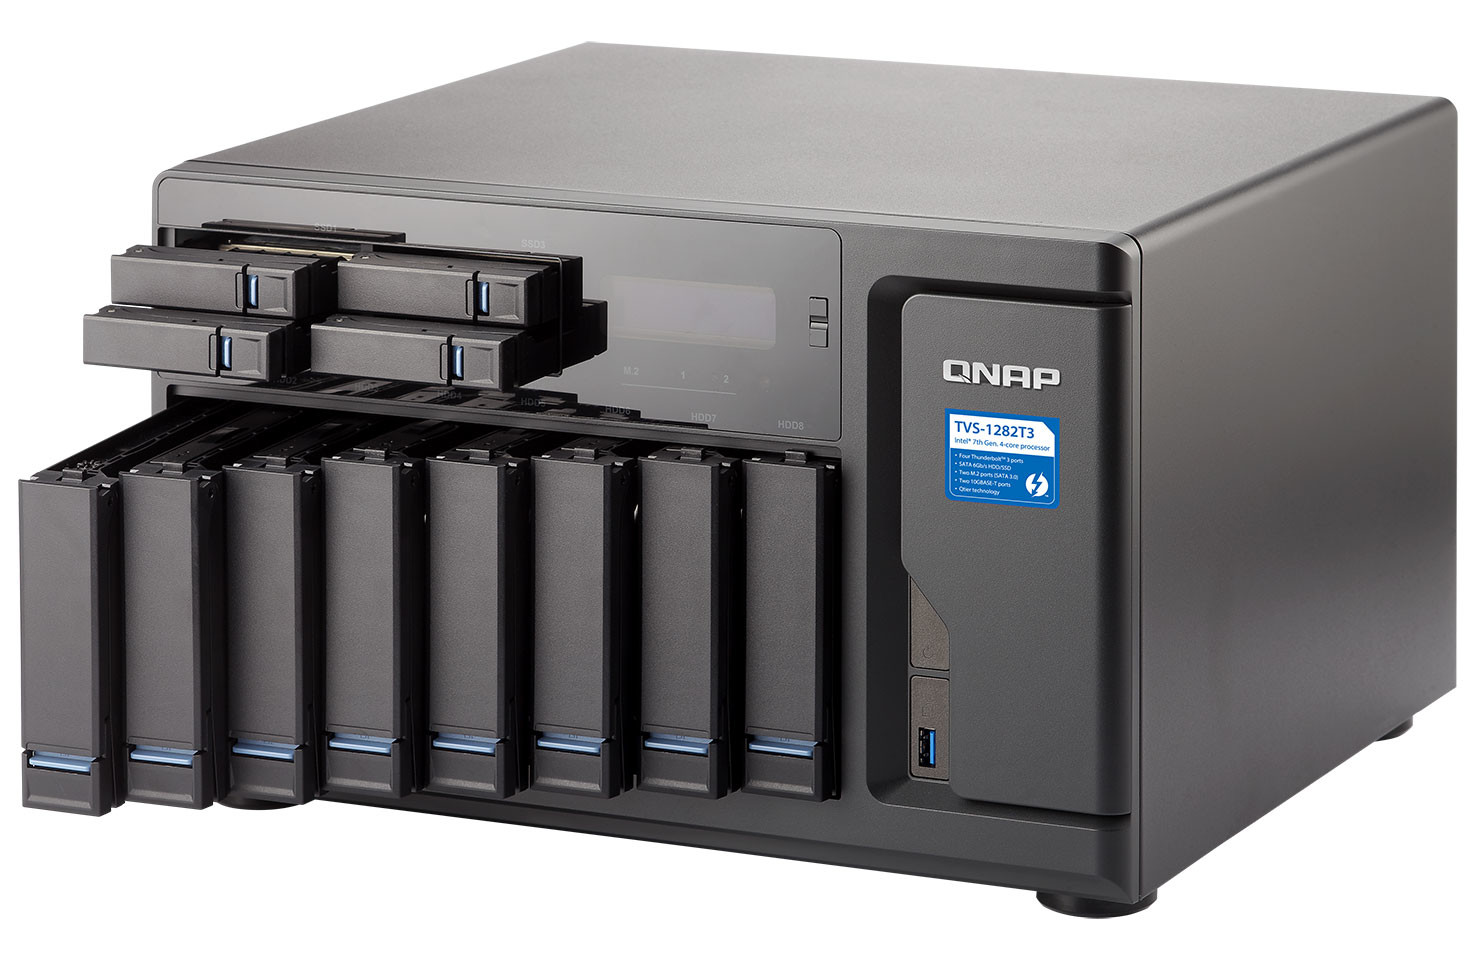 QNAP Rolls Out New TVS-1282T3 Thunderbolt 3 NAS | TechPowerUp